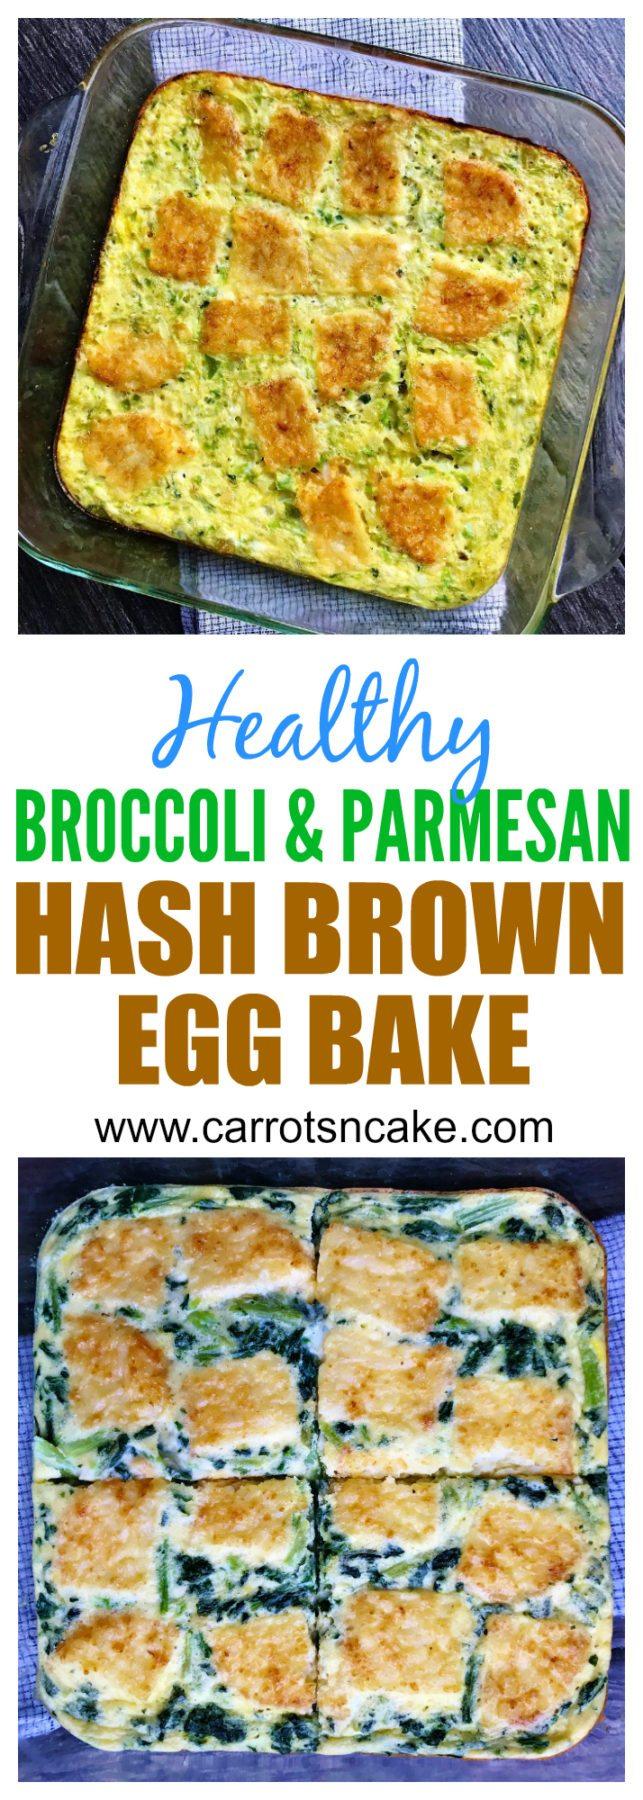 healthy-broccoli-parmesan-hash-brown-bake